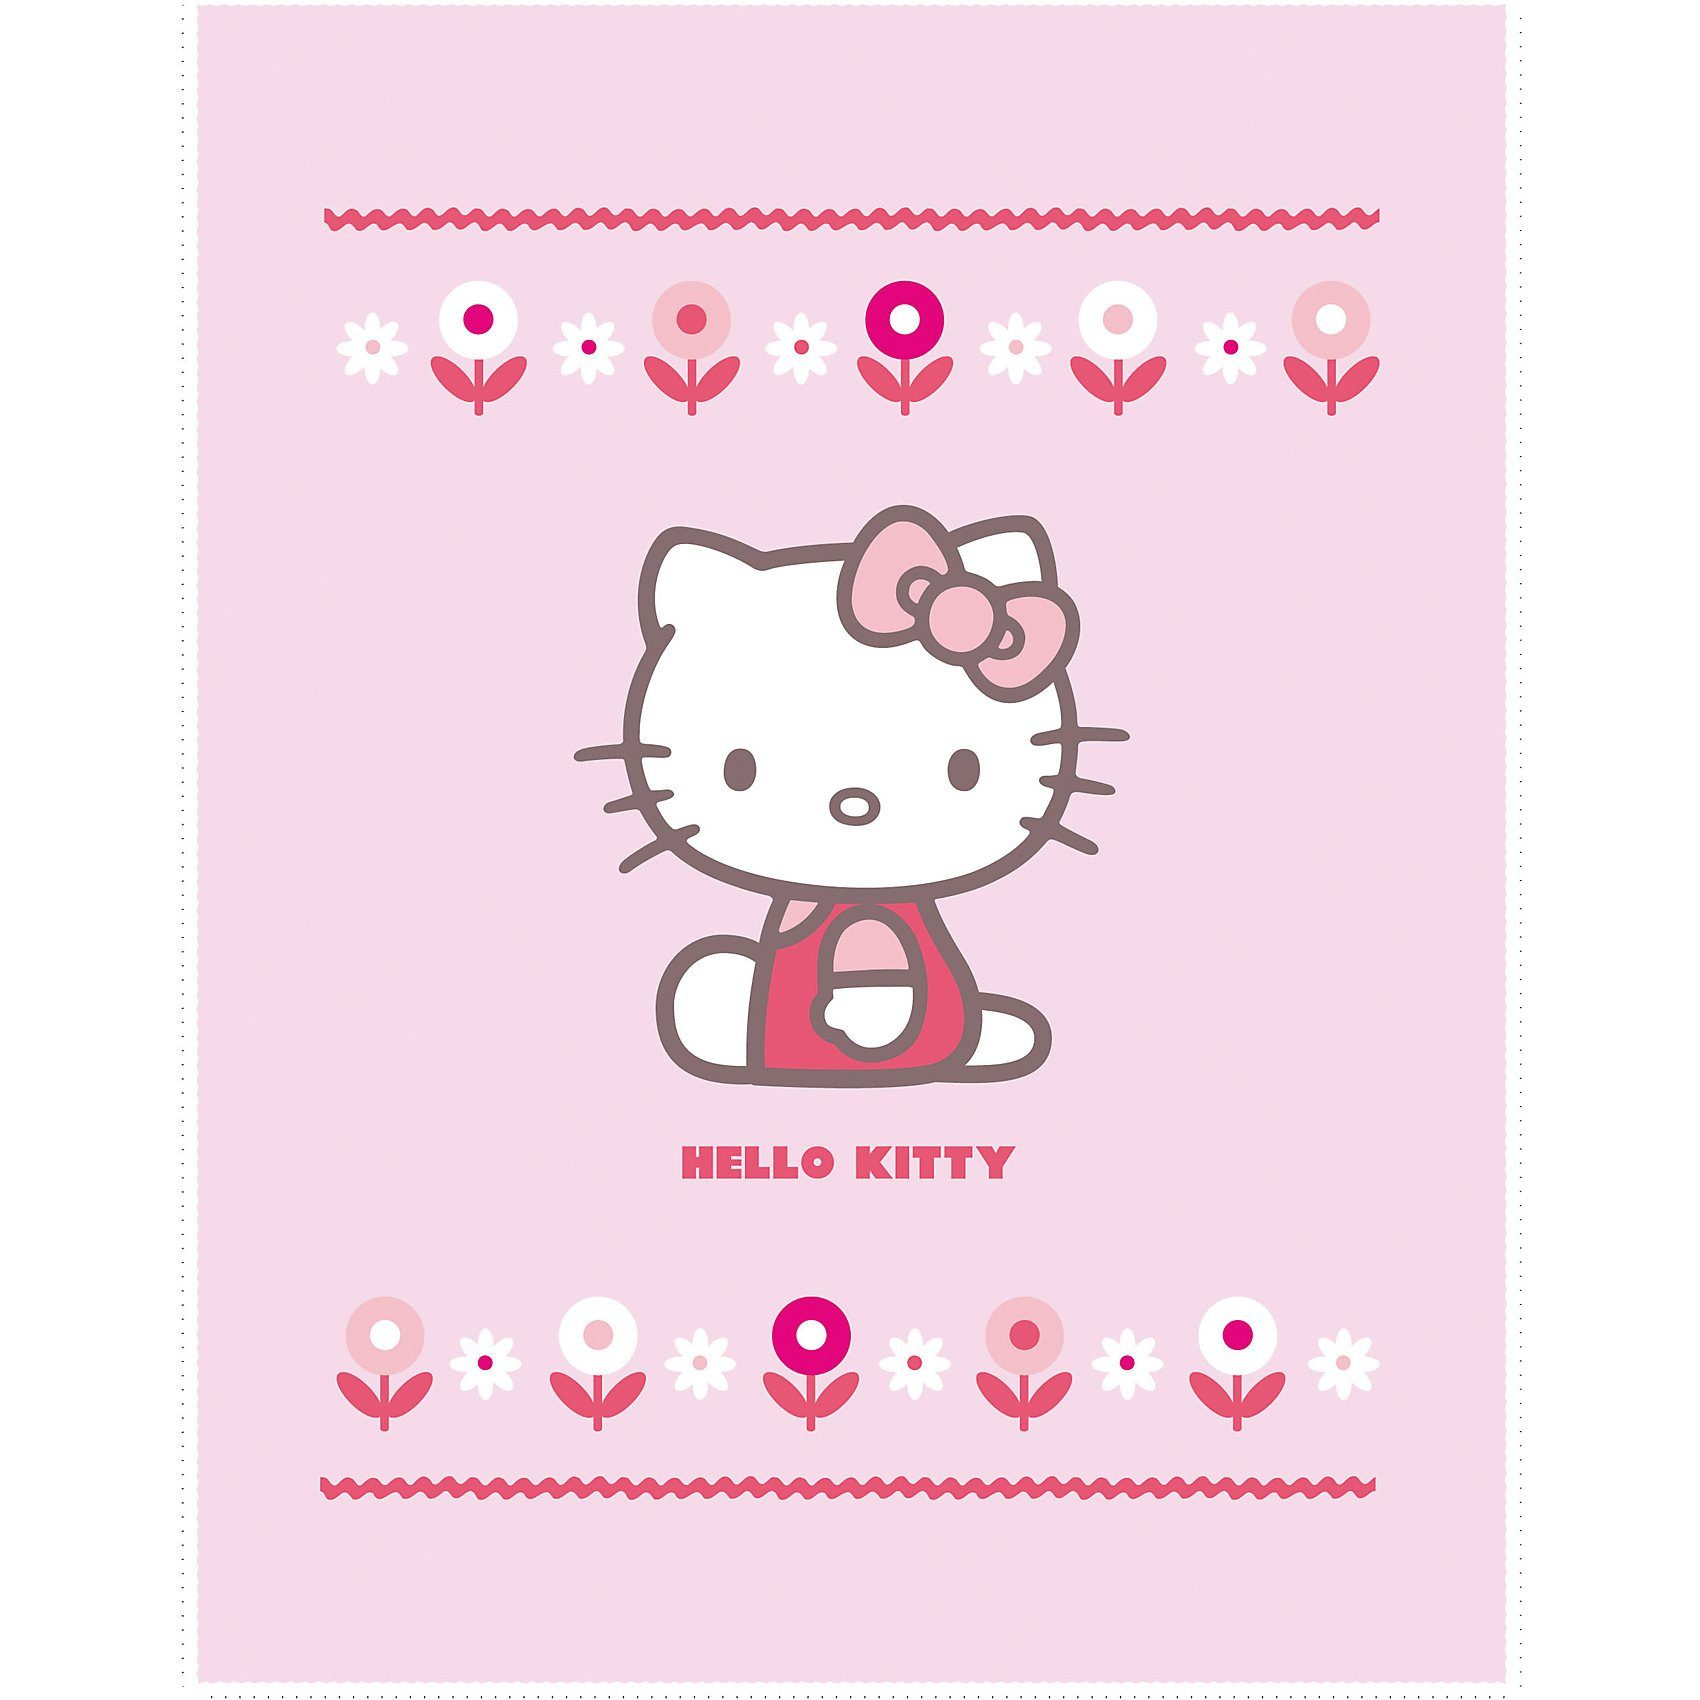 CTI Kuscheldecke Hello Kitty Caroline, 110 x 140 cm